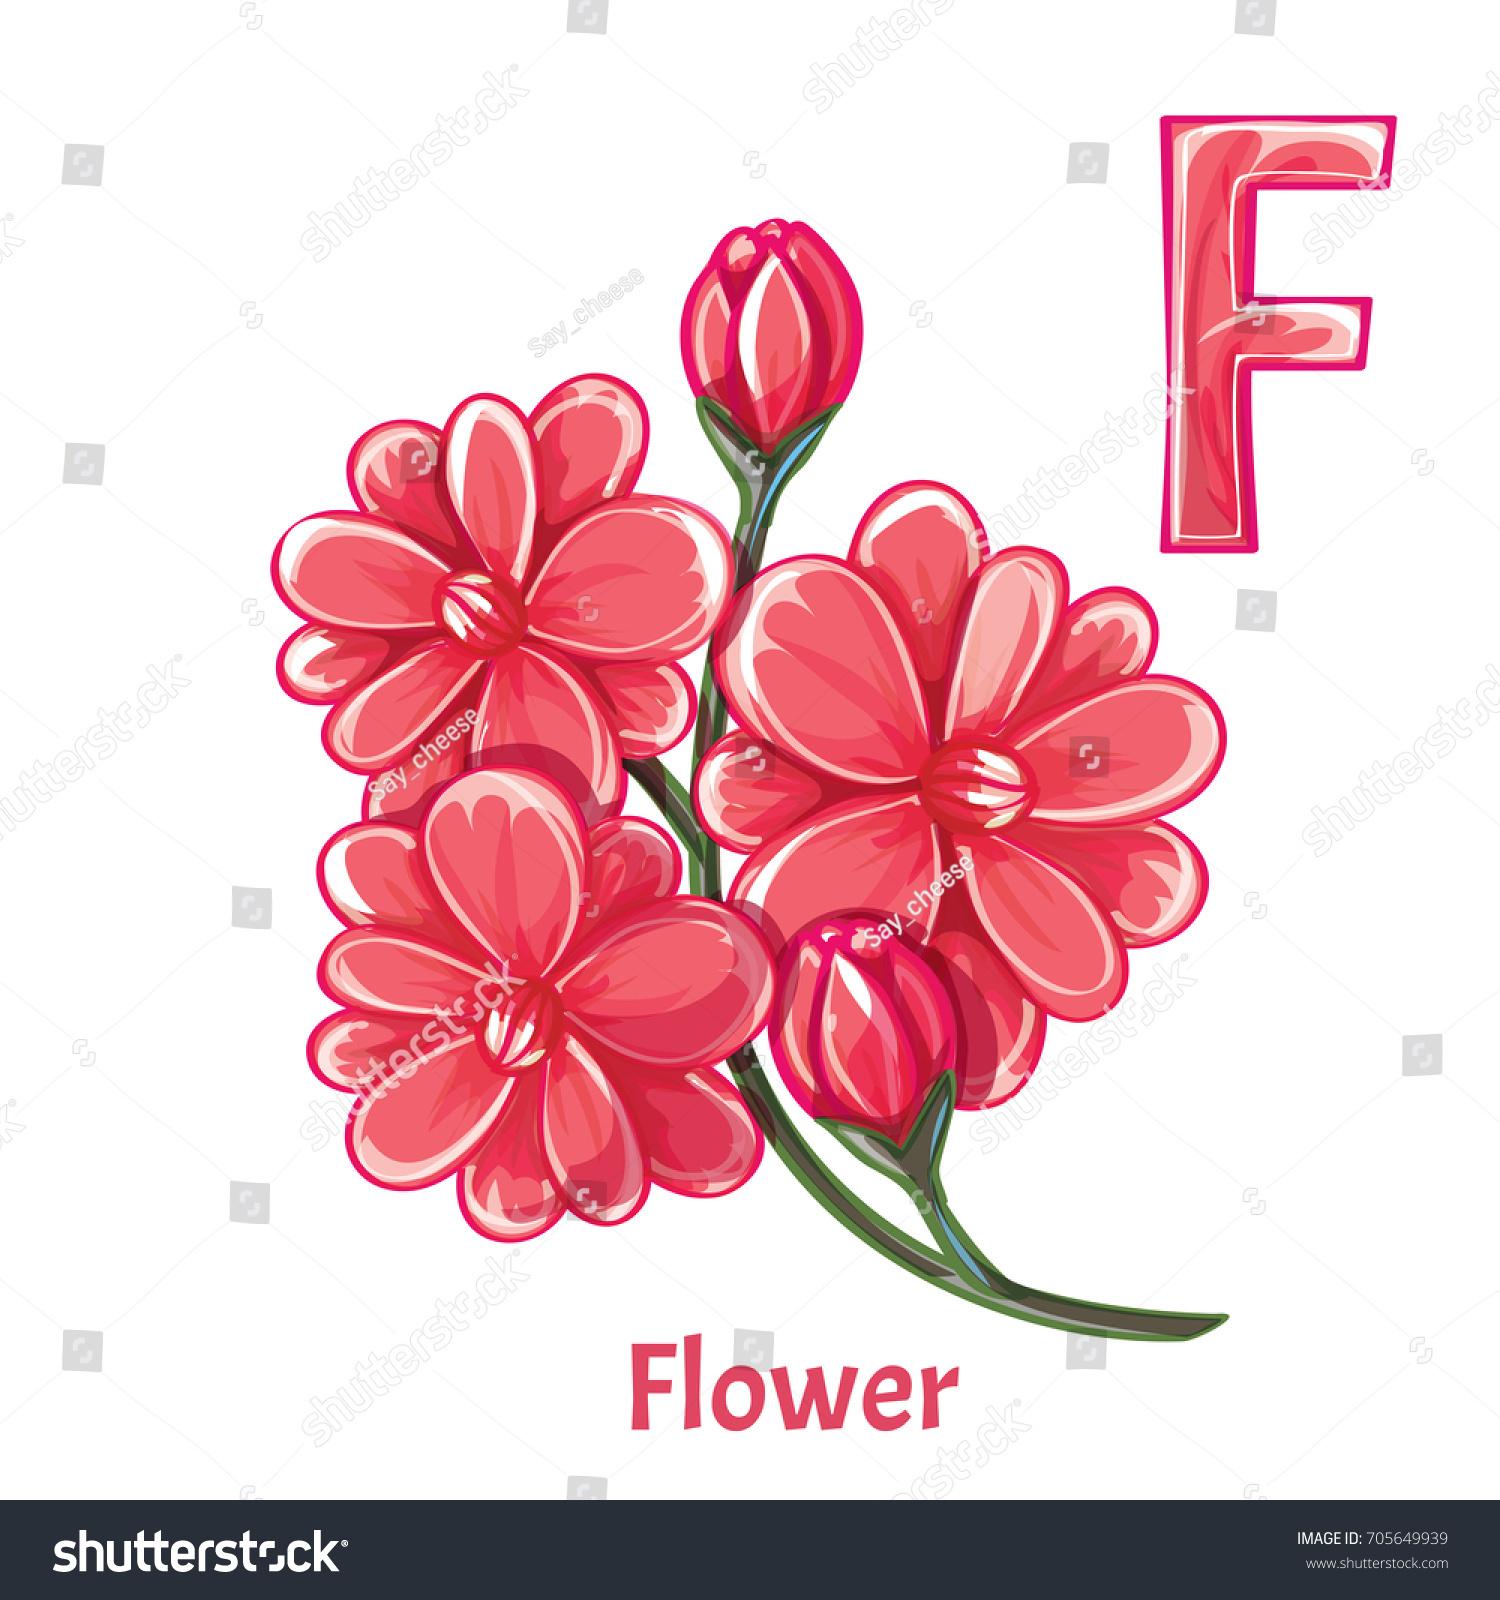 Vector Alphabet Letter F Flower Stock Vector (Royalty Free ...